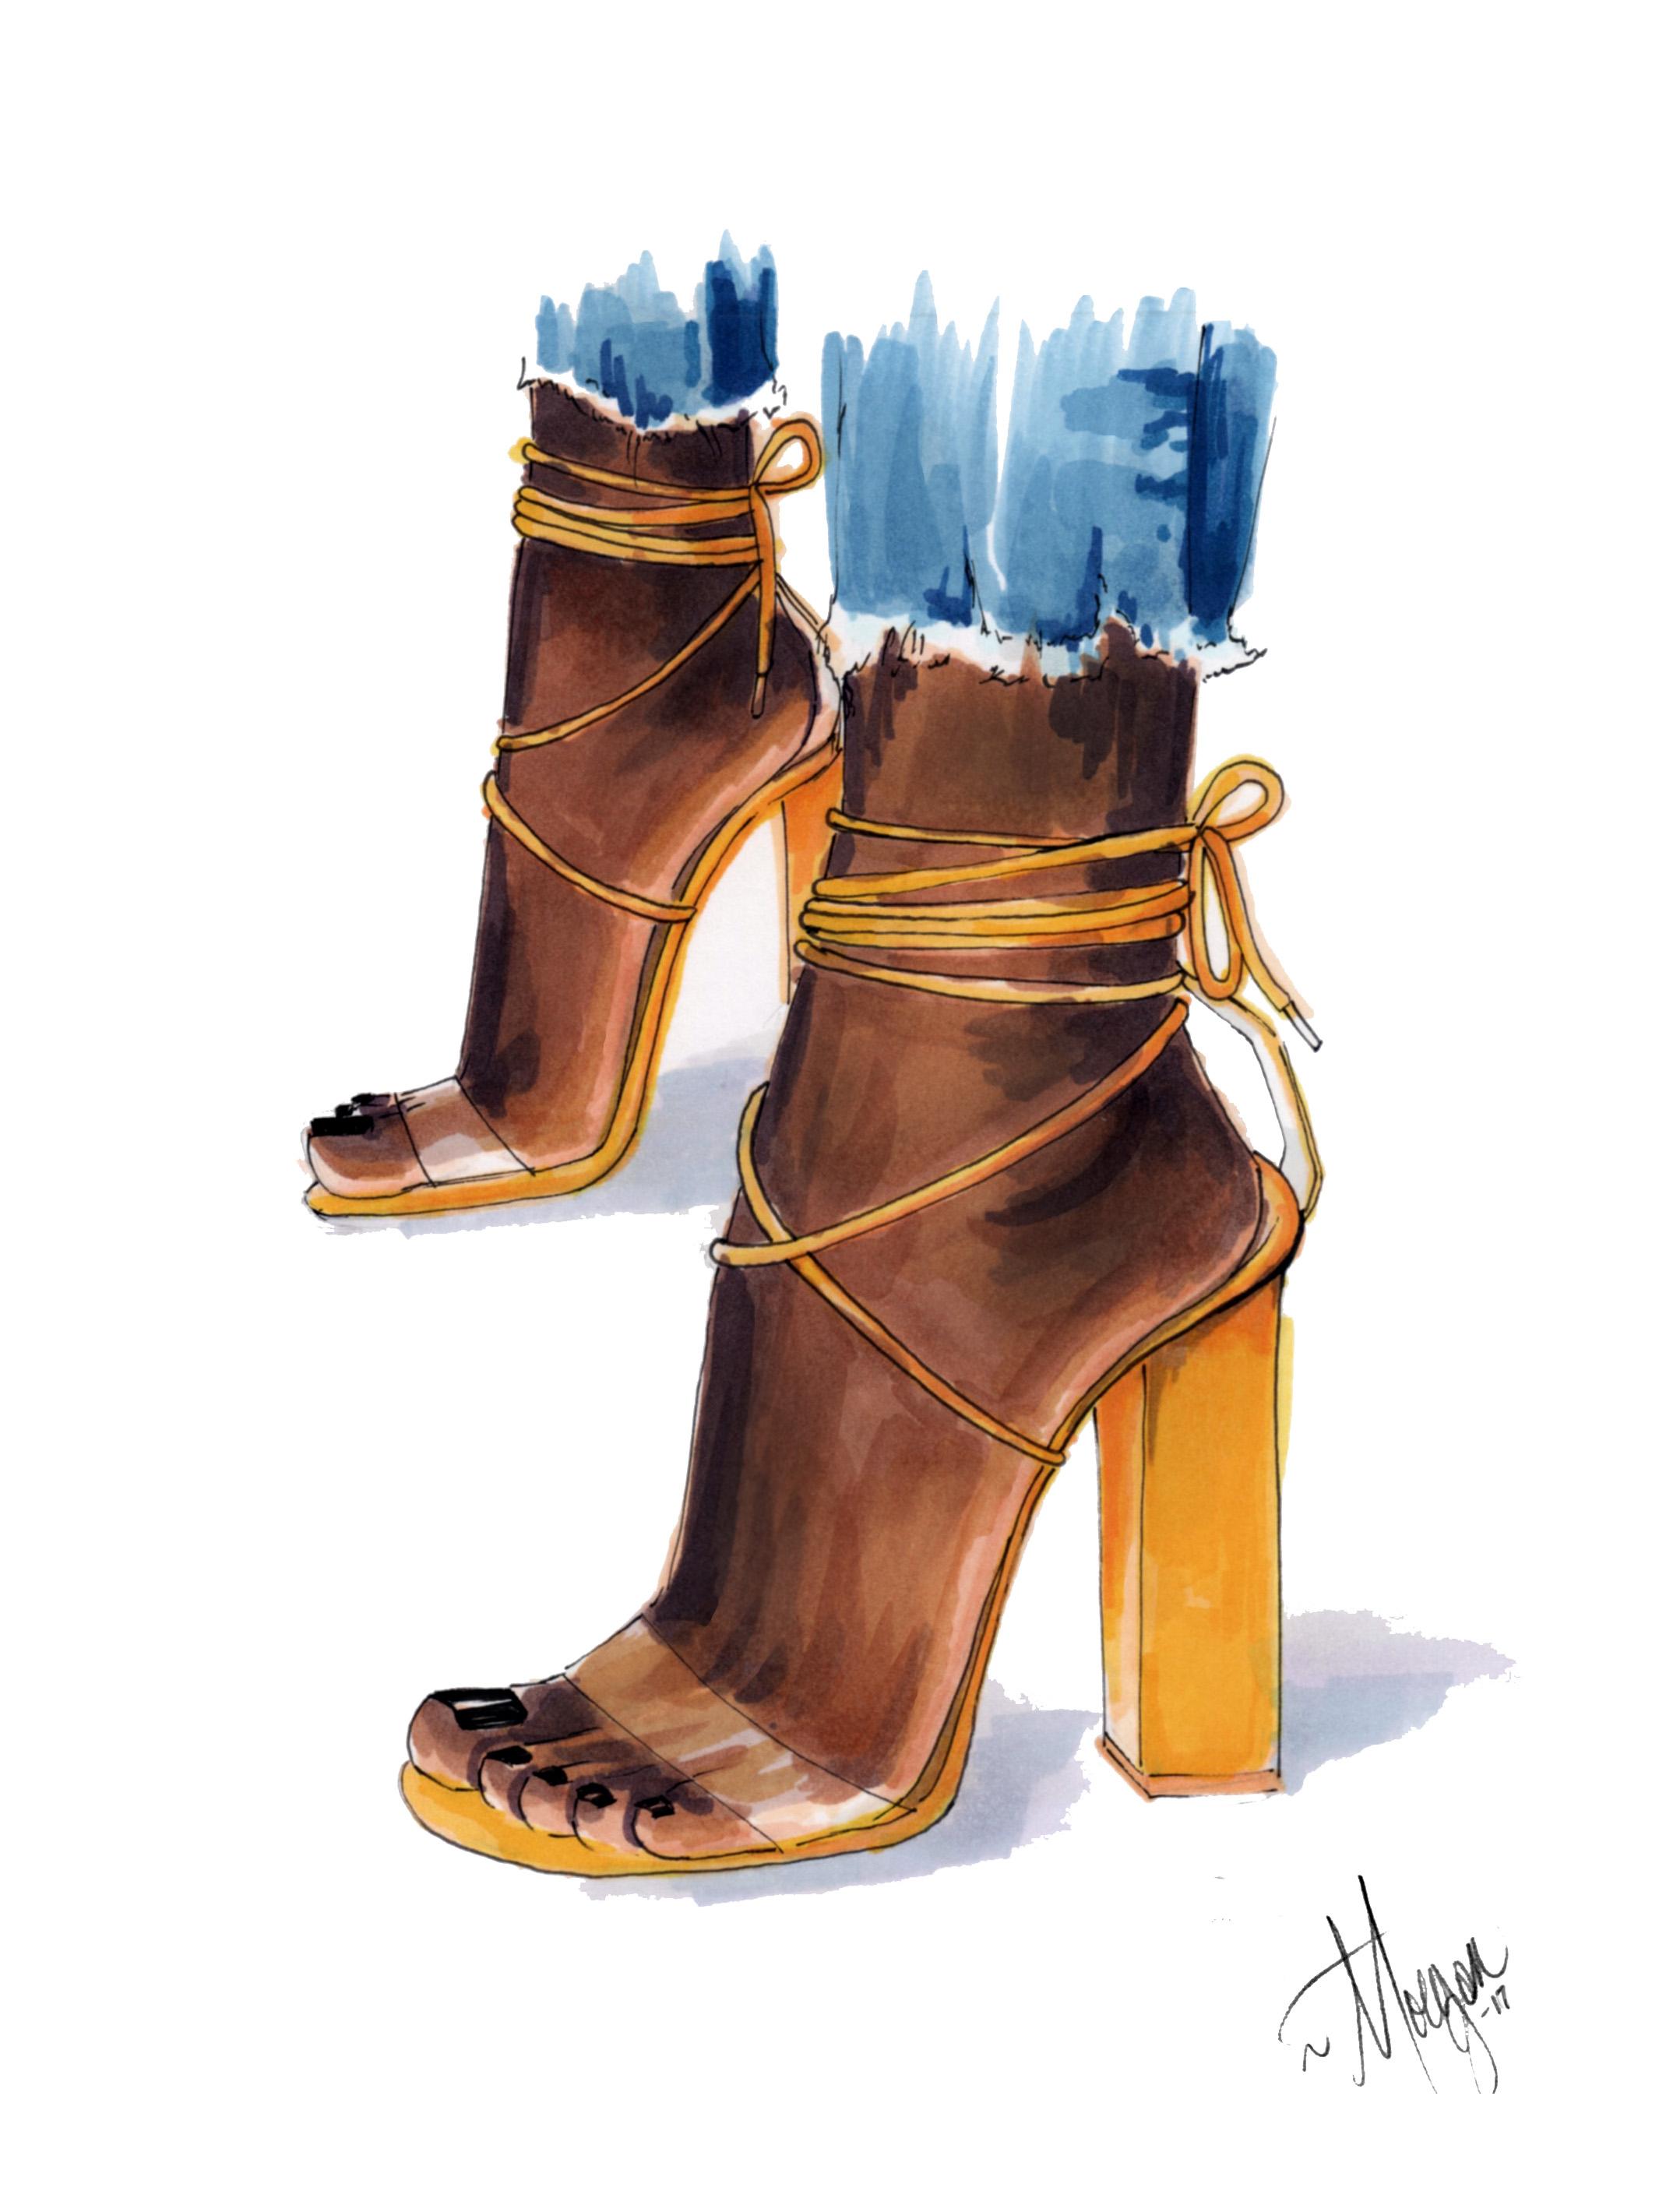 yellow-sandals-illustration-morgan-swank-studio.jpg